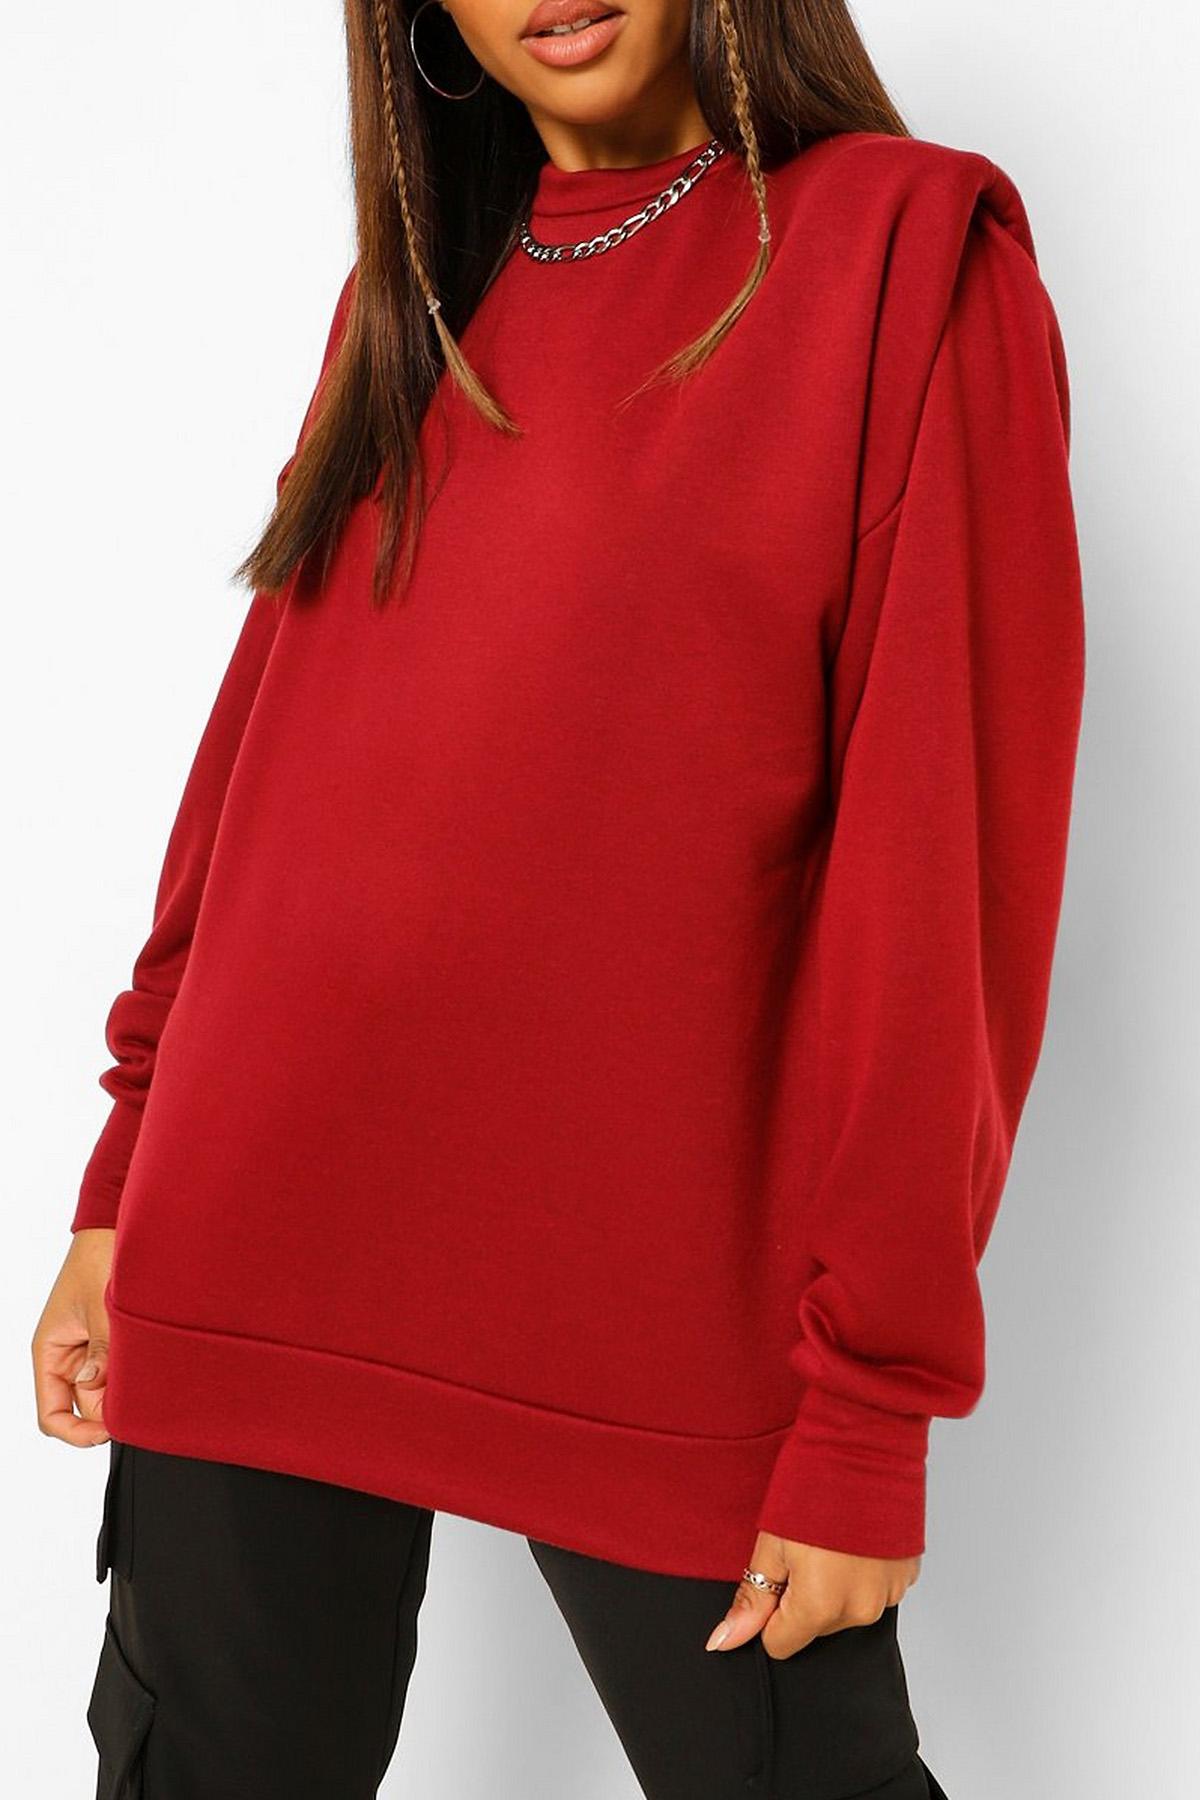 XHAN - Bordo Vatkalı Sweatshirt 1KXK8-44260-05